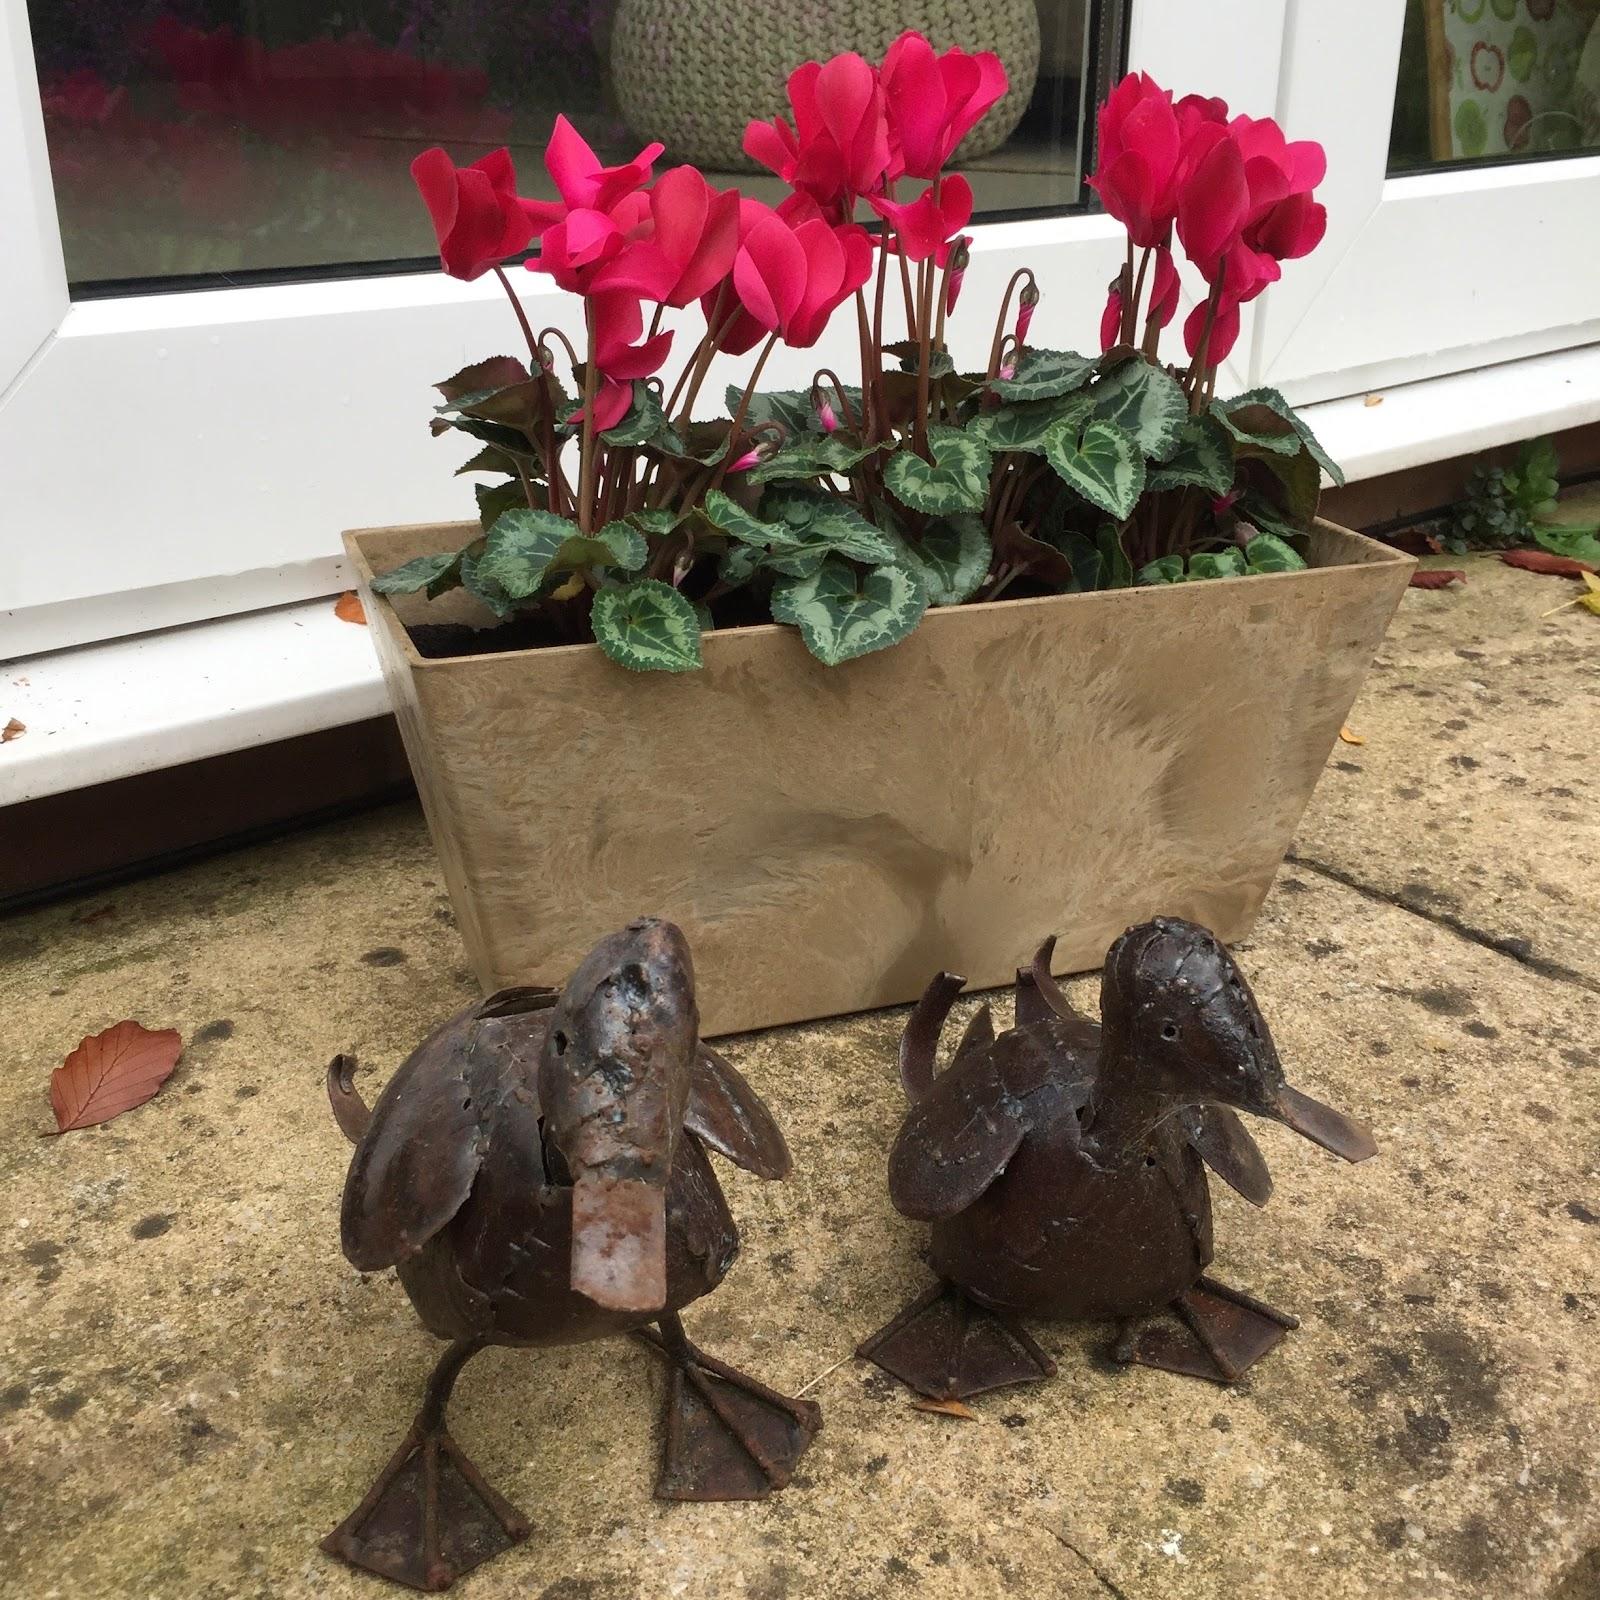 Winter Flowers For Garden Planters Garden Tea Cakes And Me